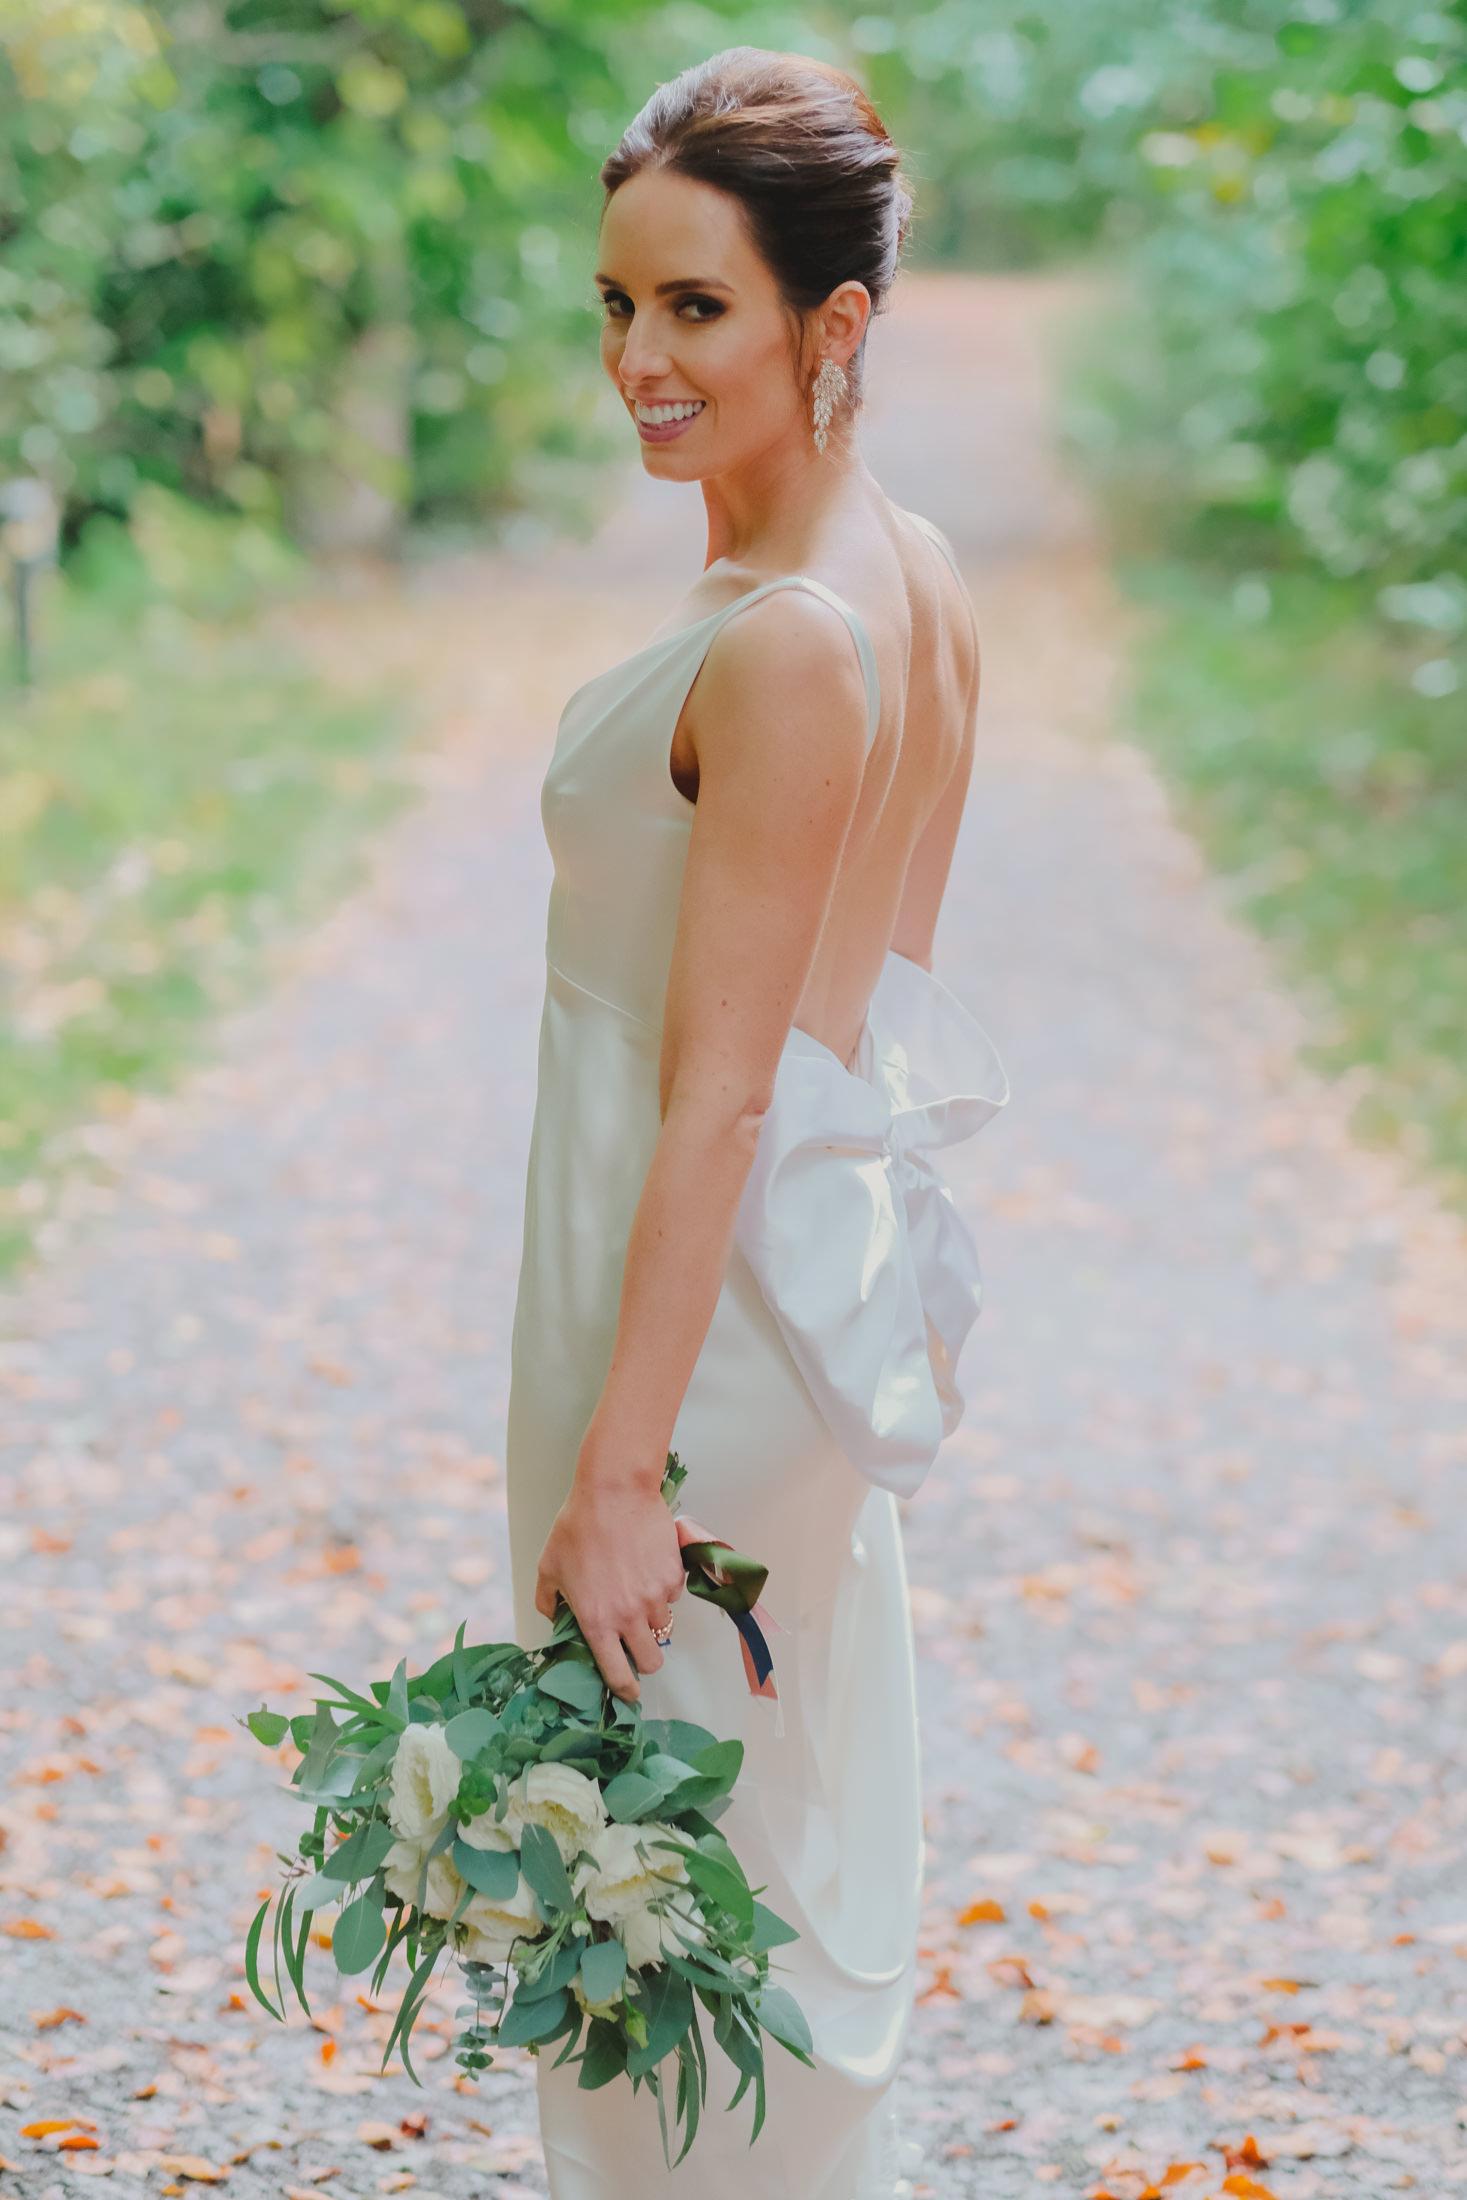 Aoibheann McCaul wedding 7